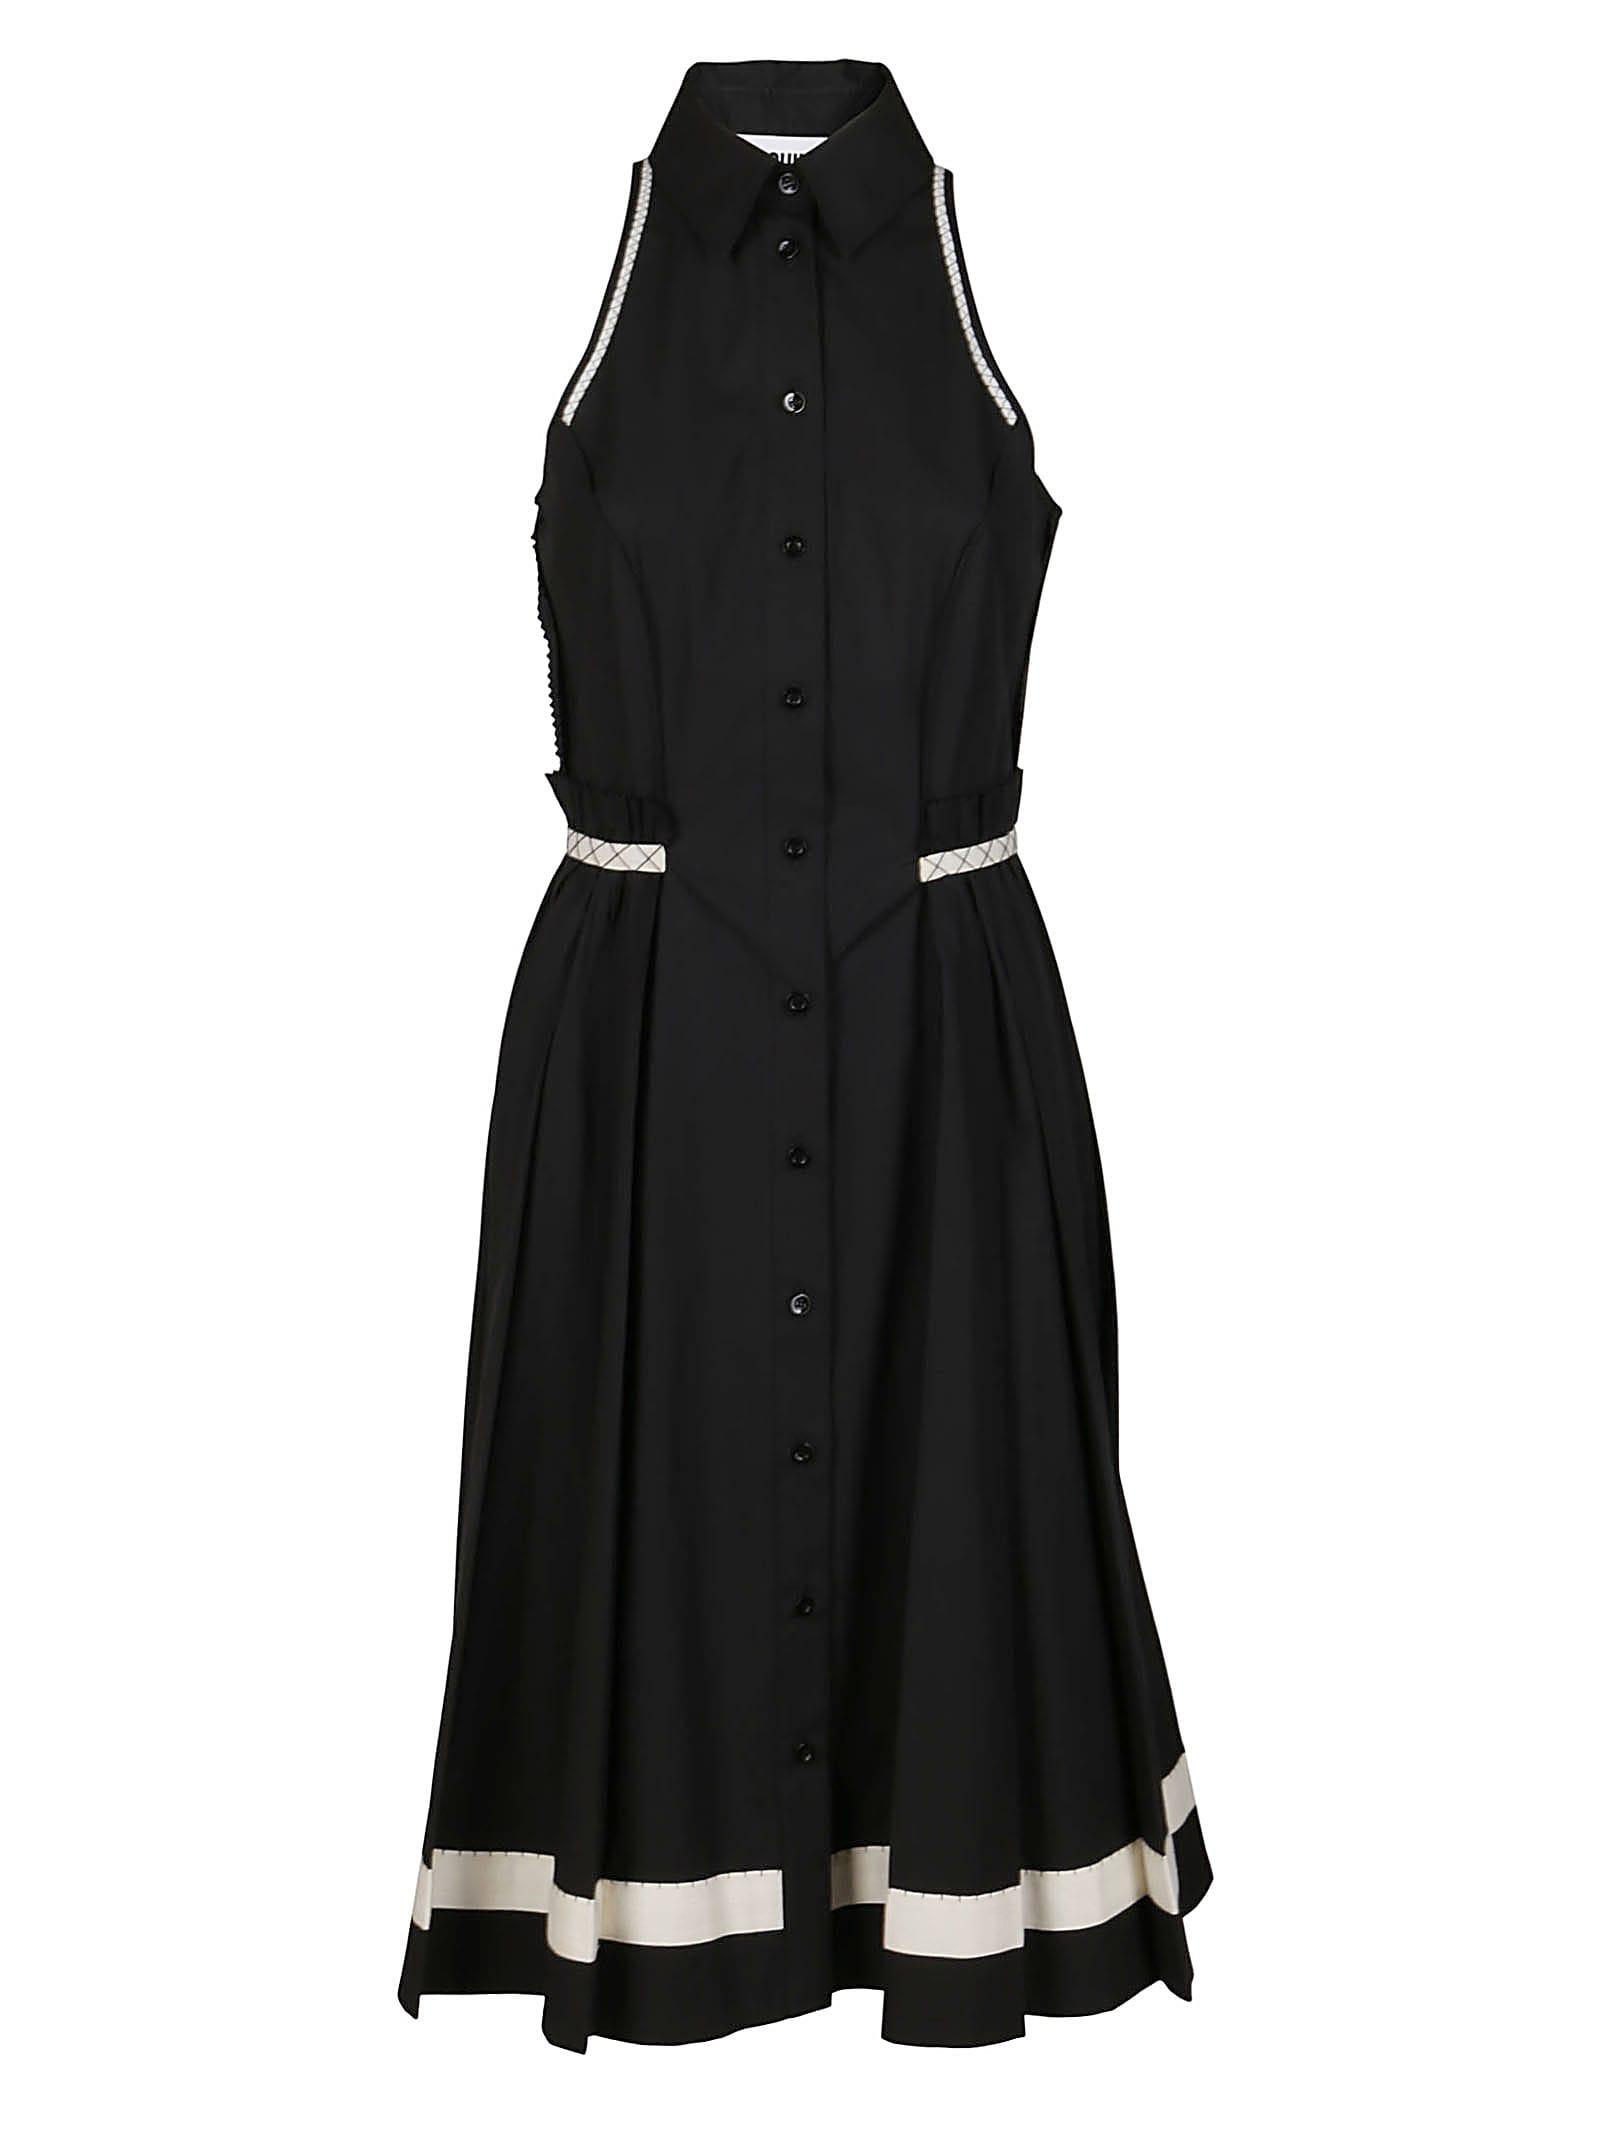 Moschino Clothing BLACK COTTON DRESS